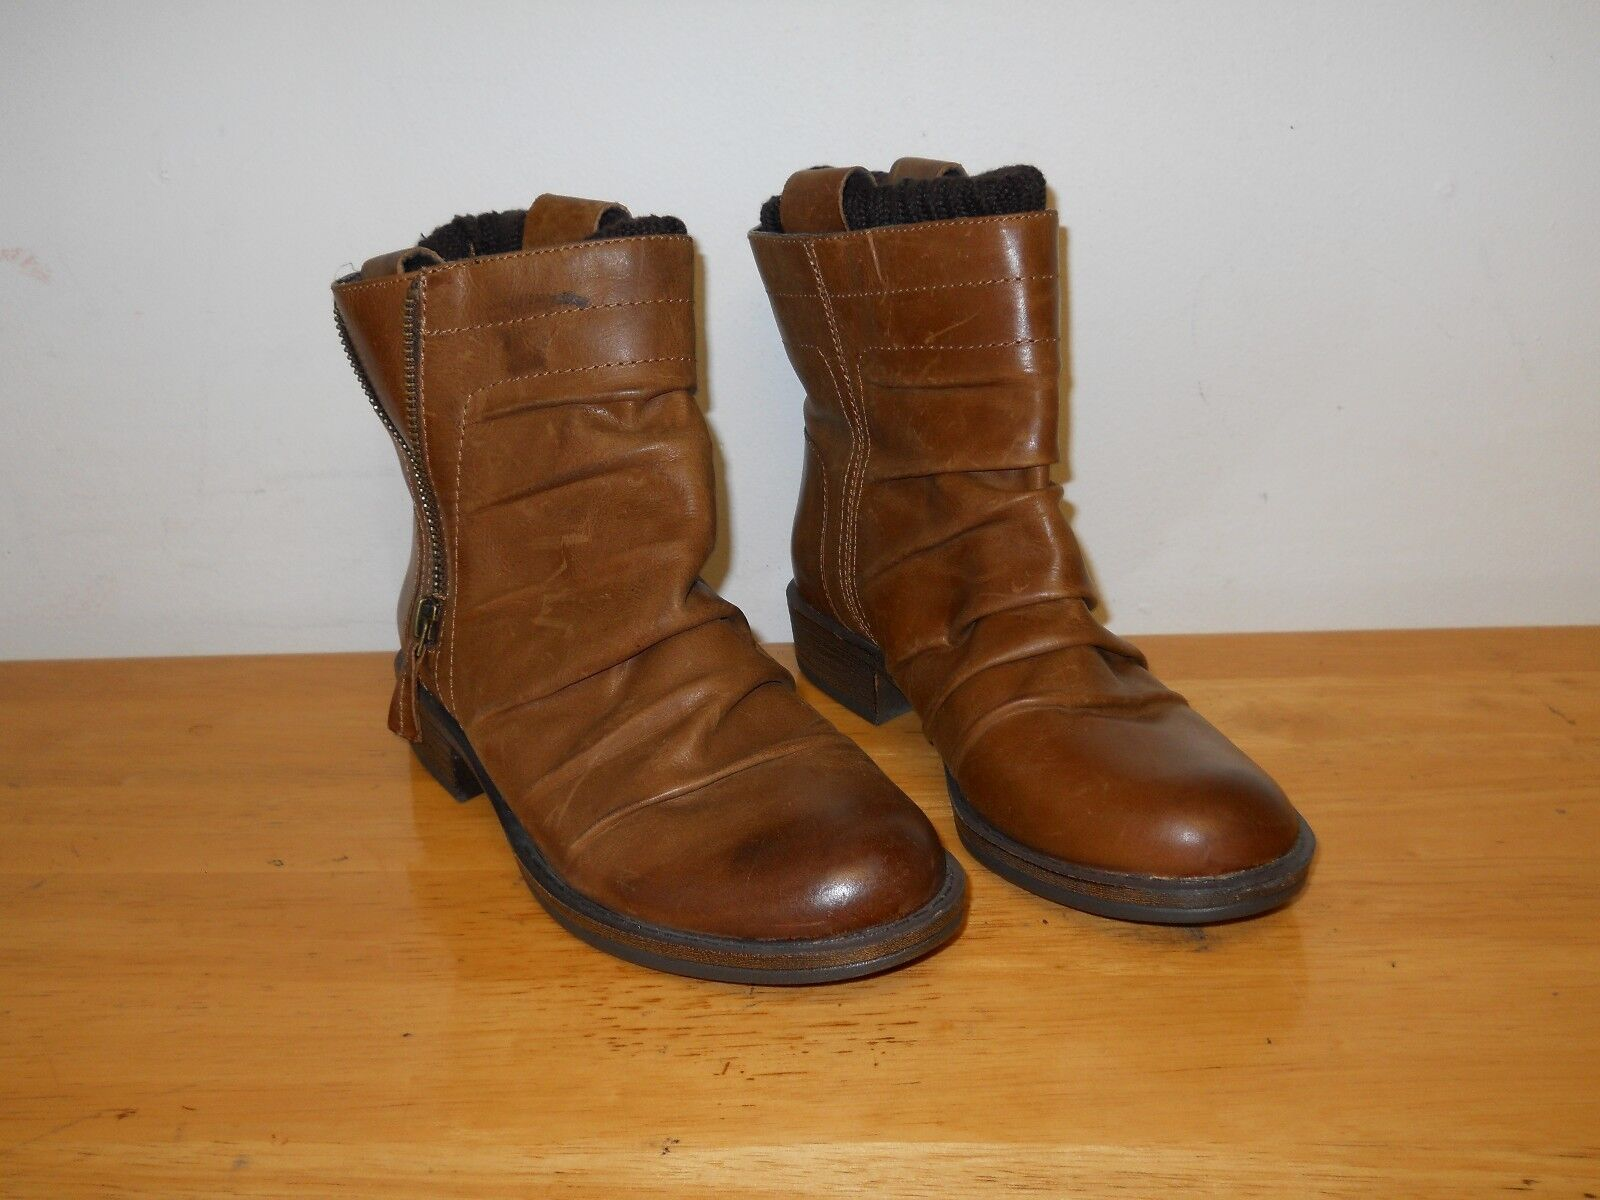 Gianni Bini New Display Model femmes marron Ankle bottes 6 M chaussures NWOB